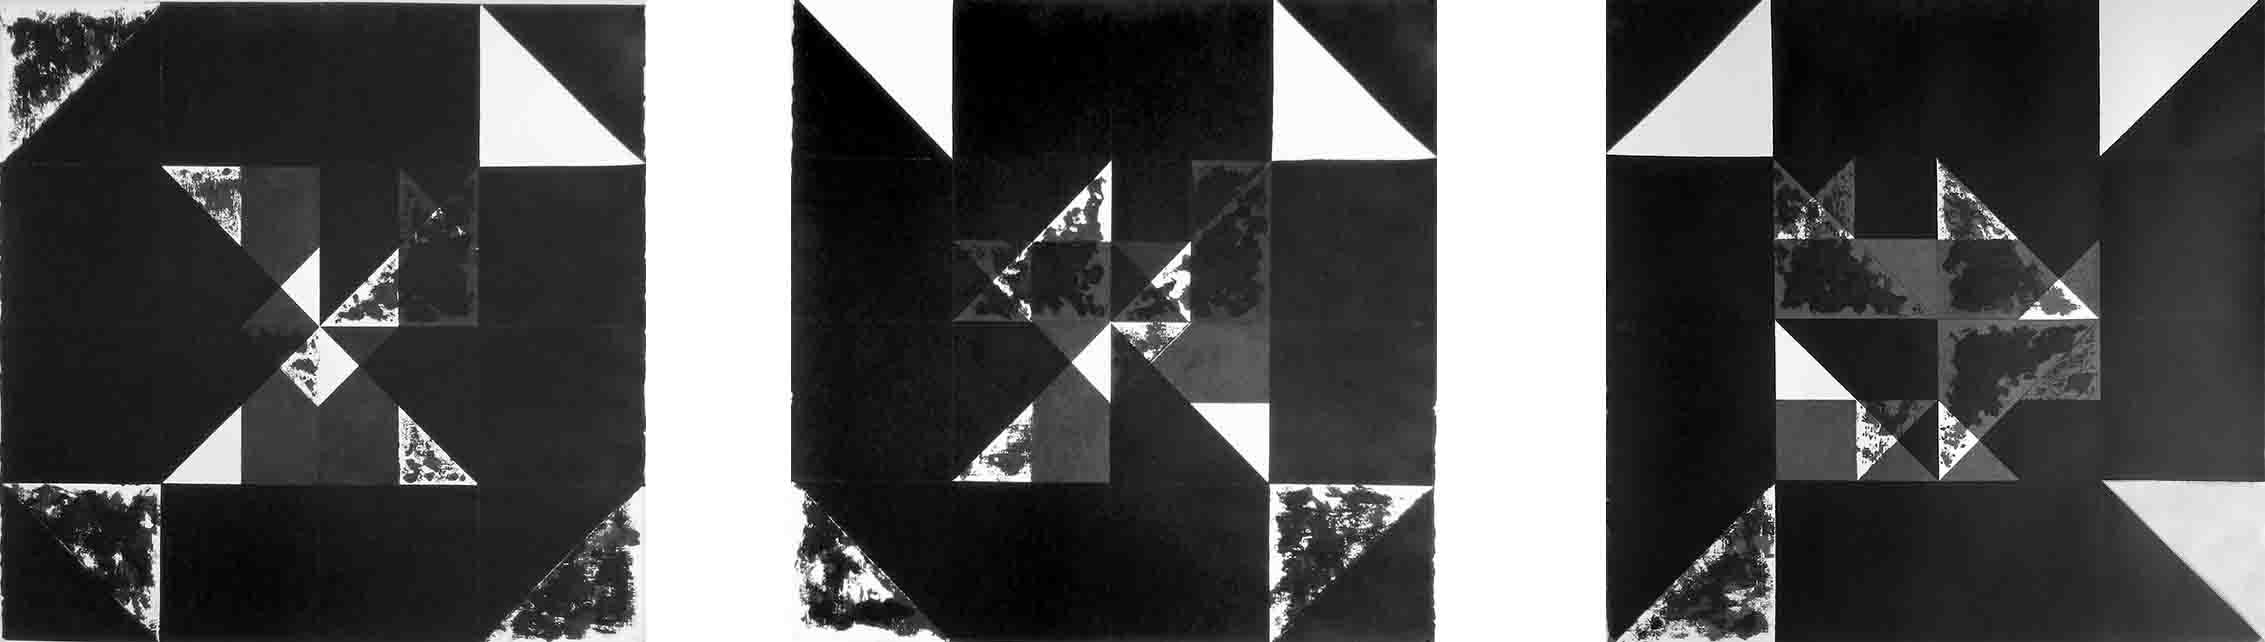 ALBERT AYME - Nuicts n° 20, 21, 22 - Un exercice de style - 1995